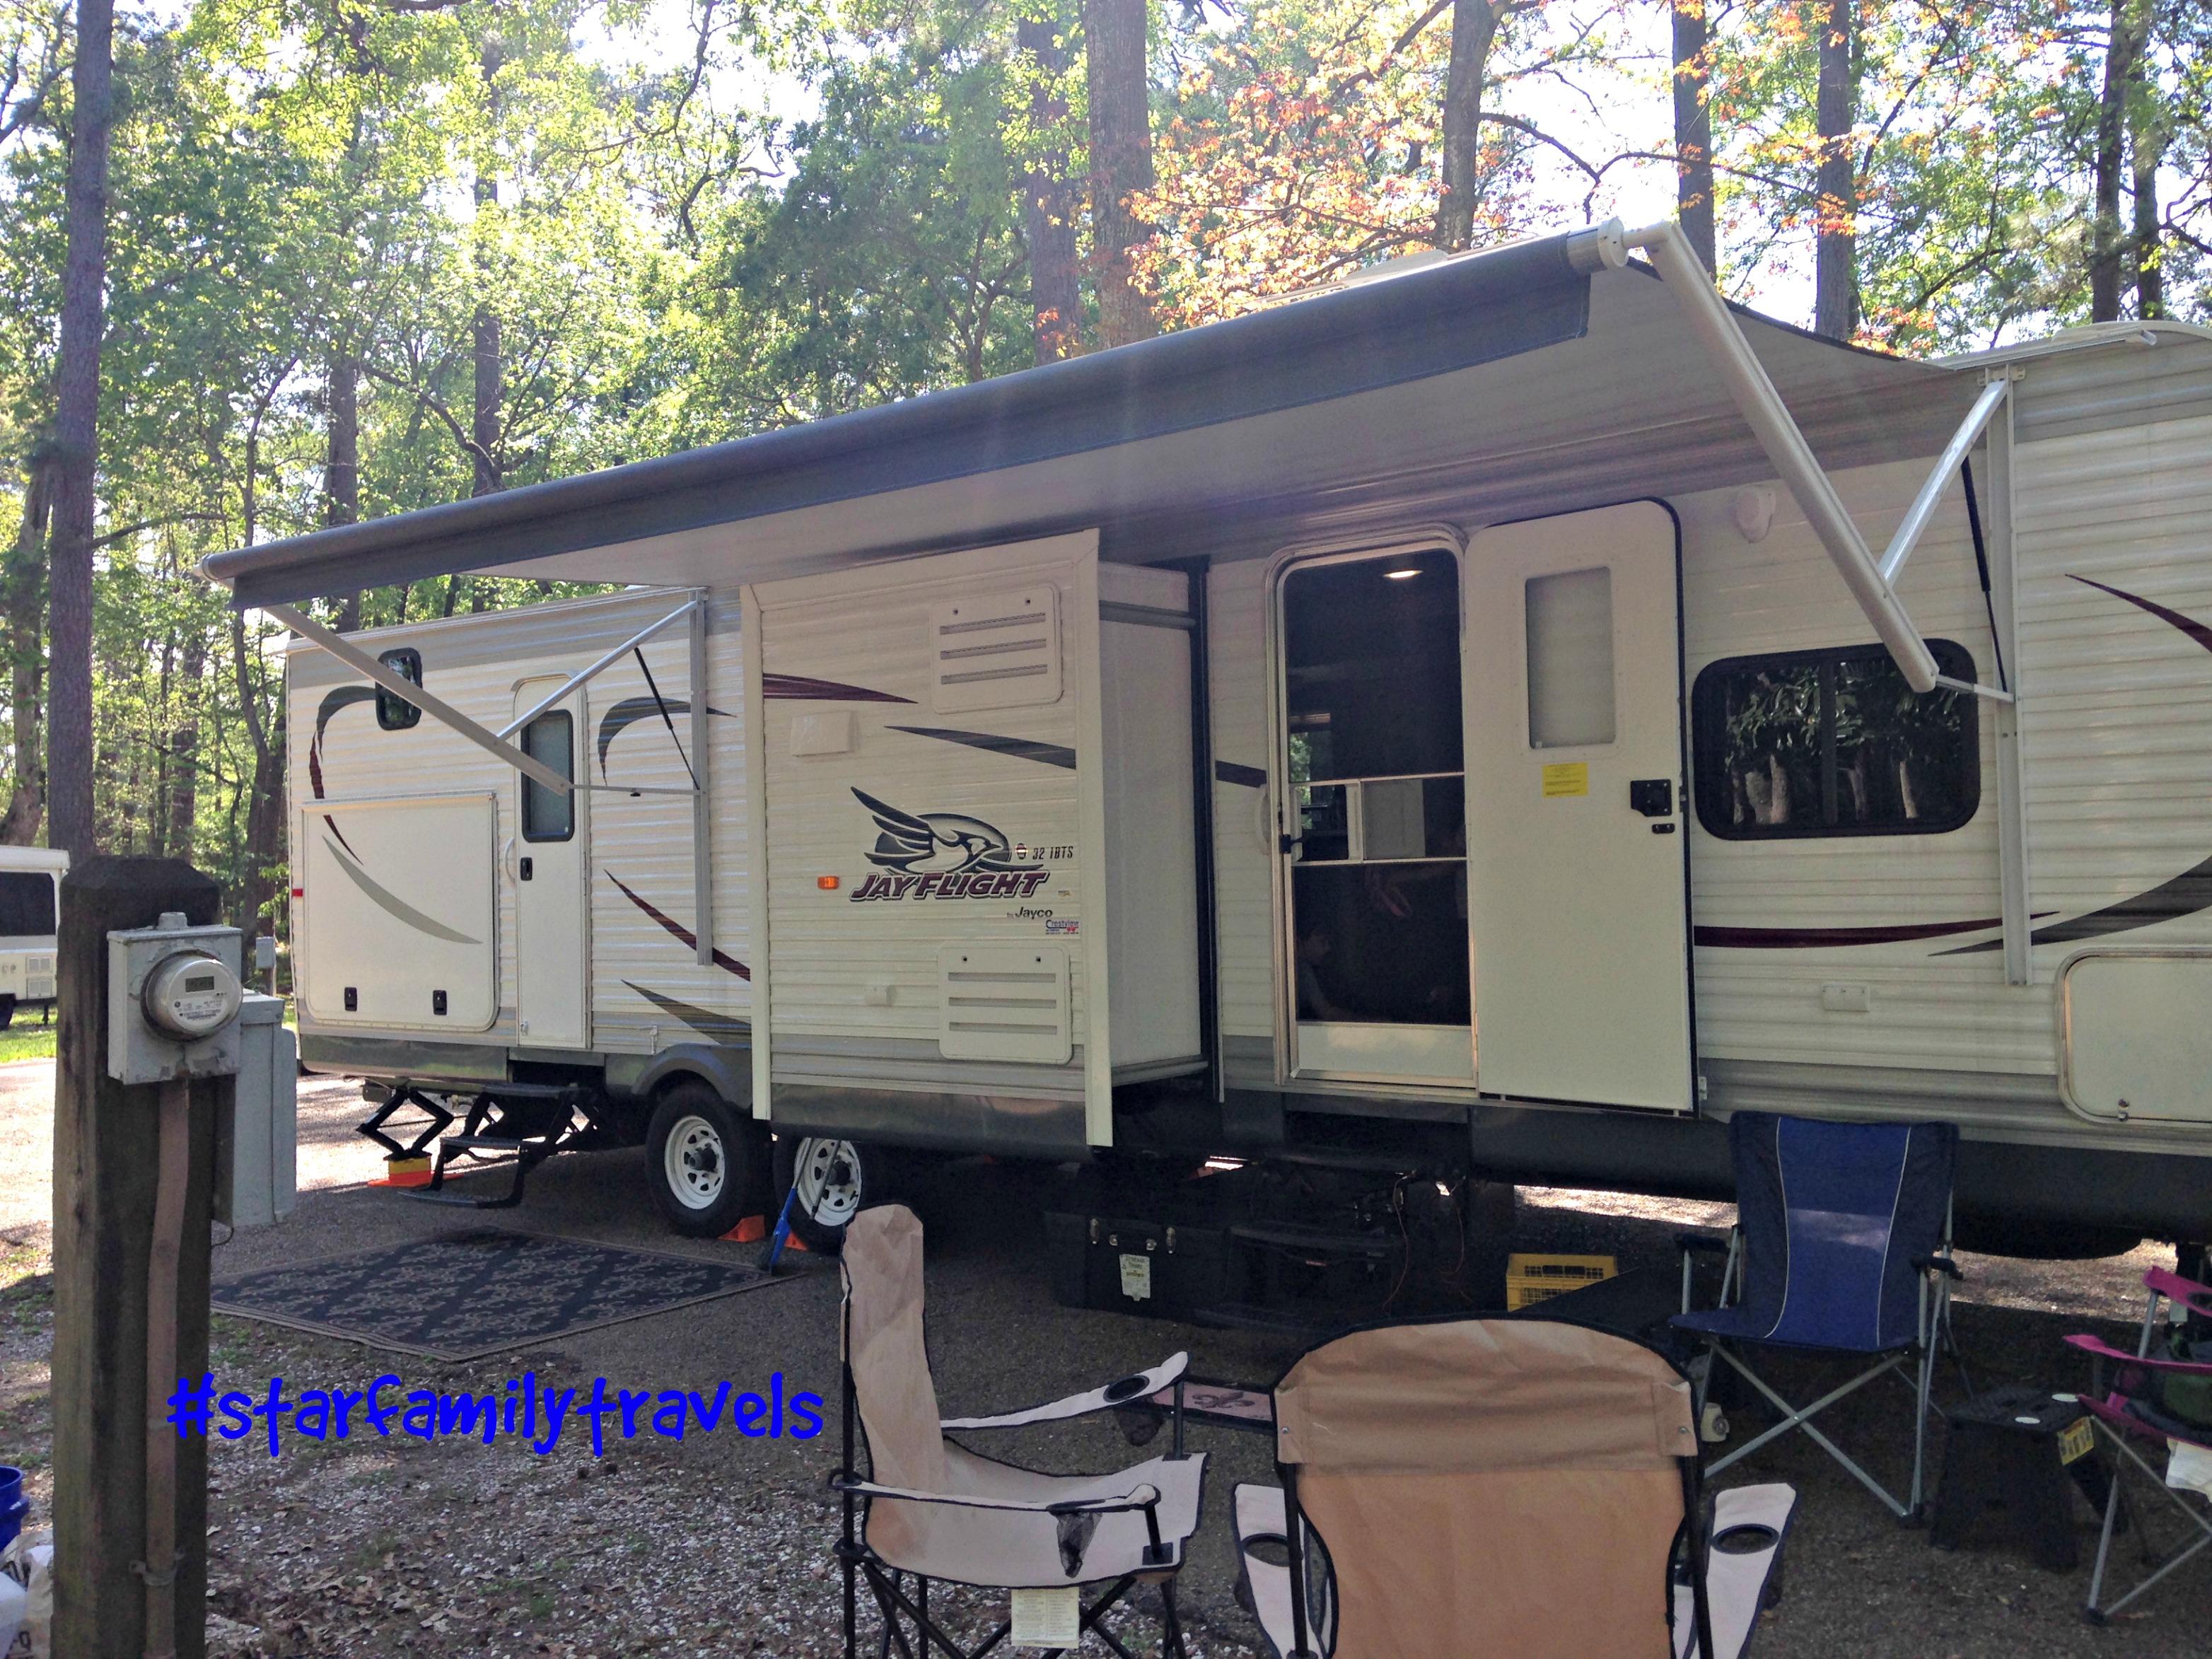 Louisiana State Park Travel